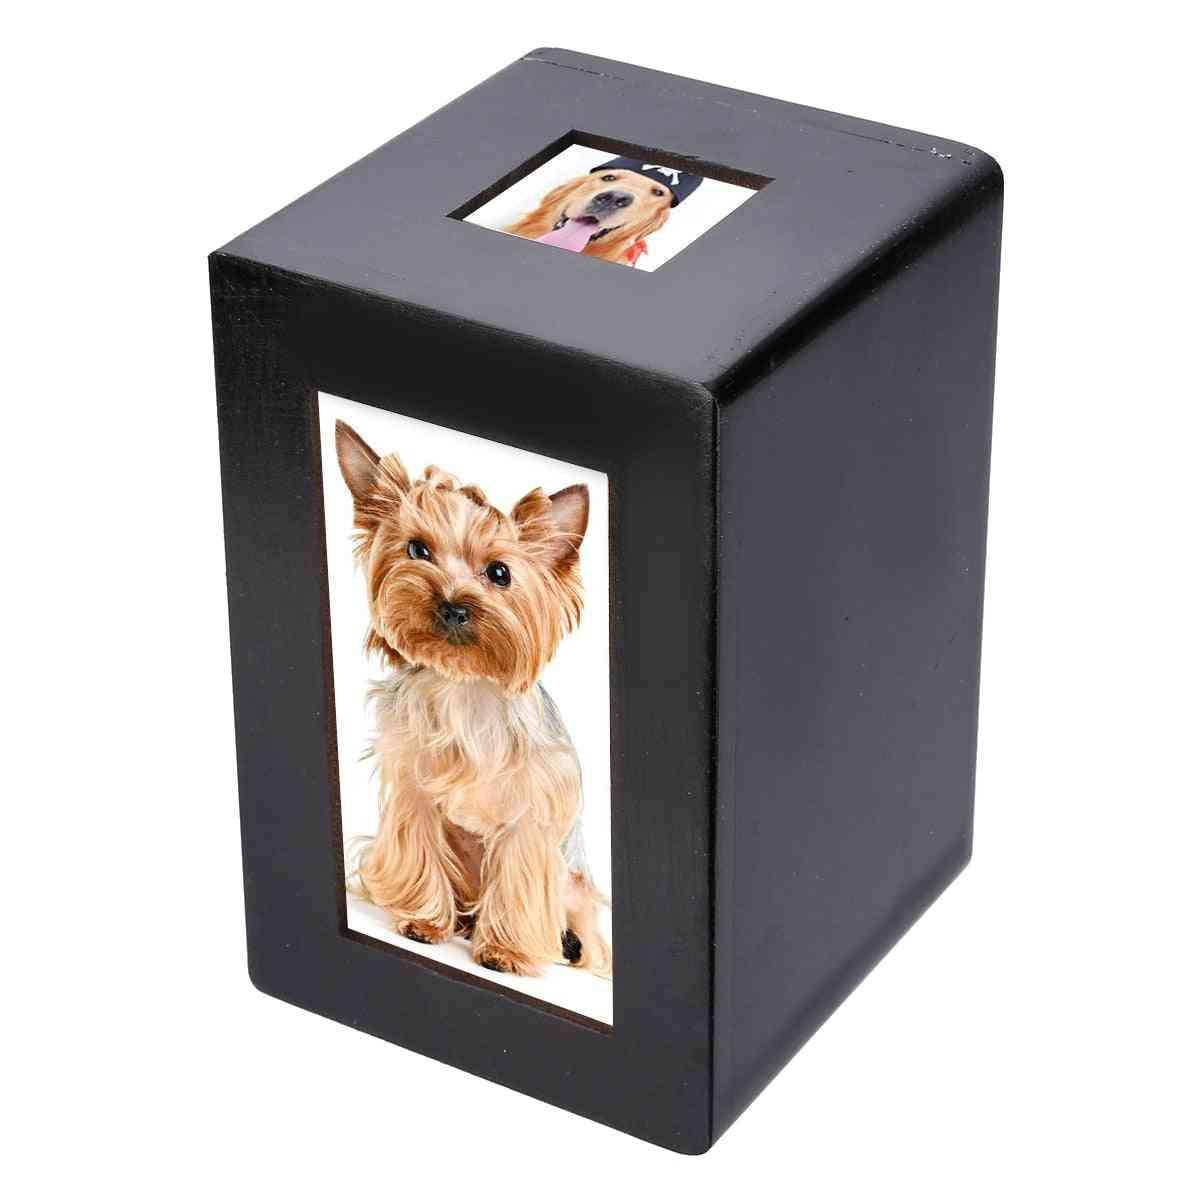 Mayitr Black Wooden Pet Urn Box